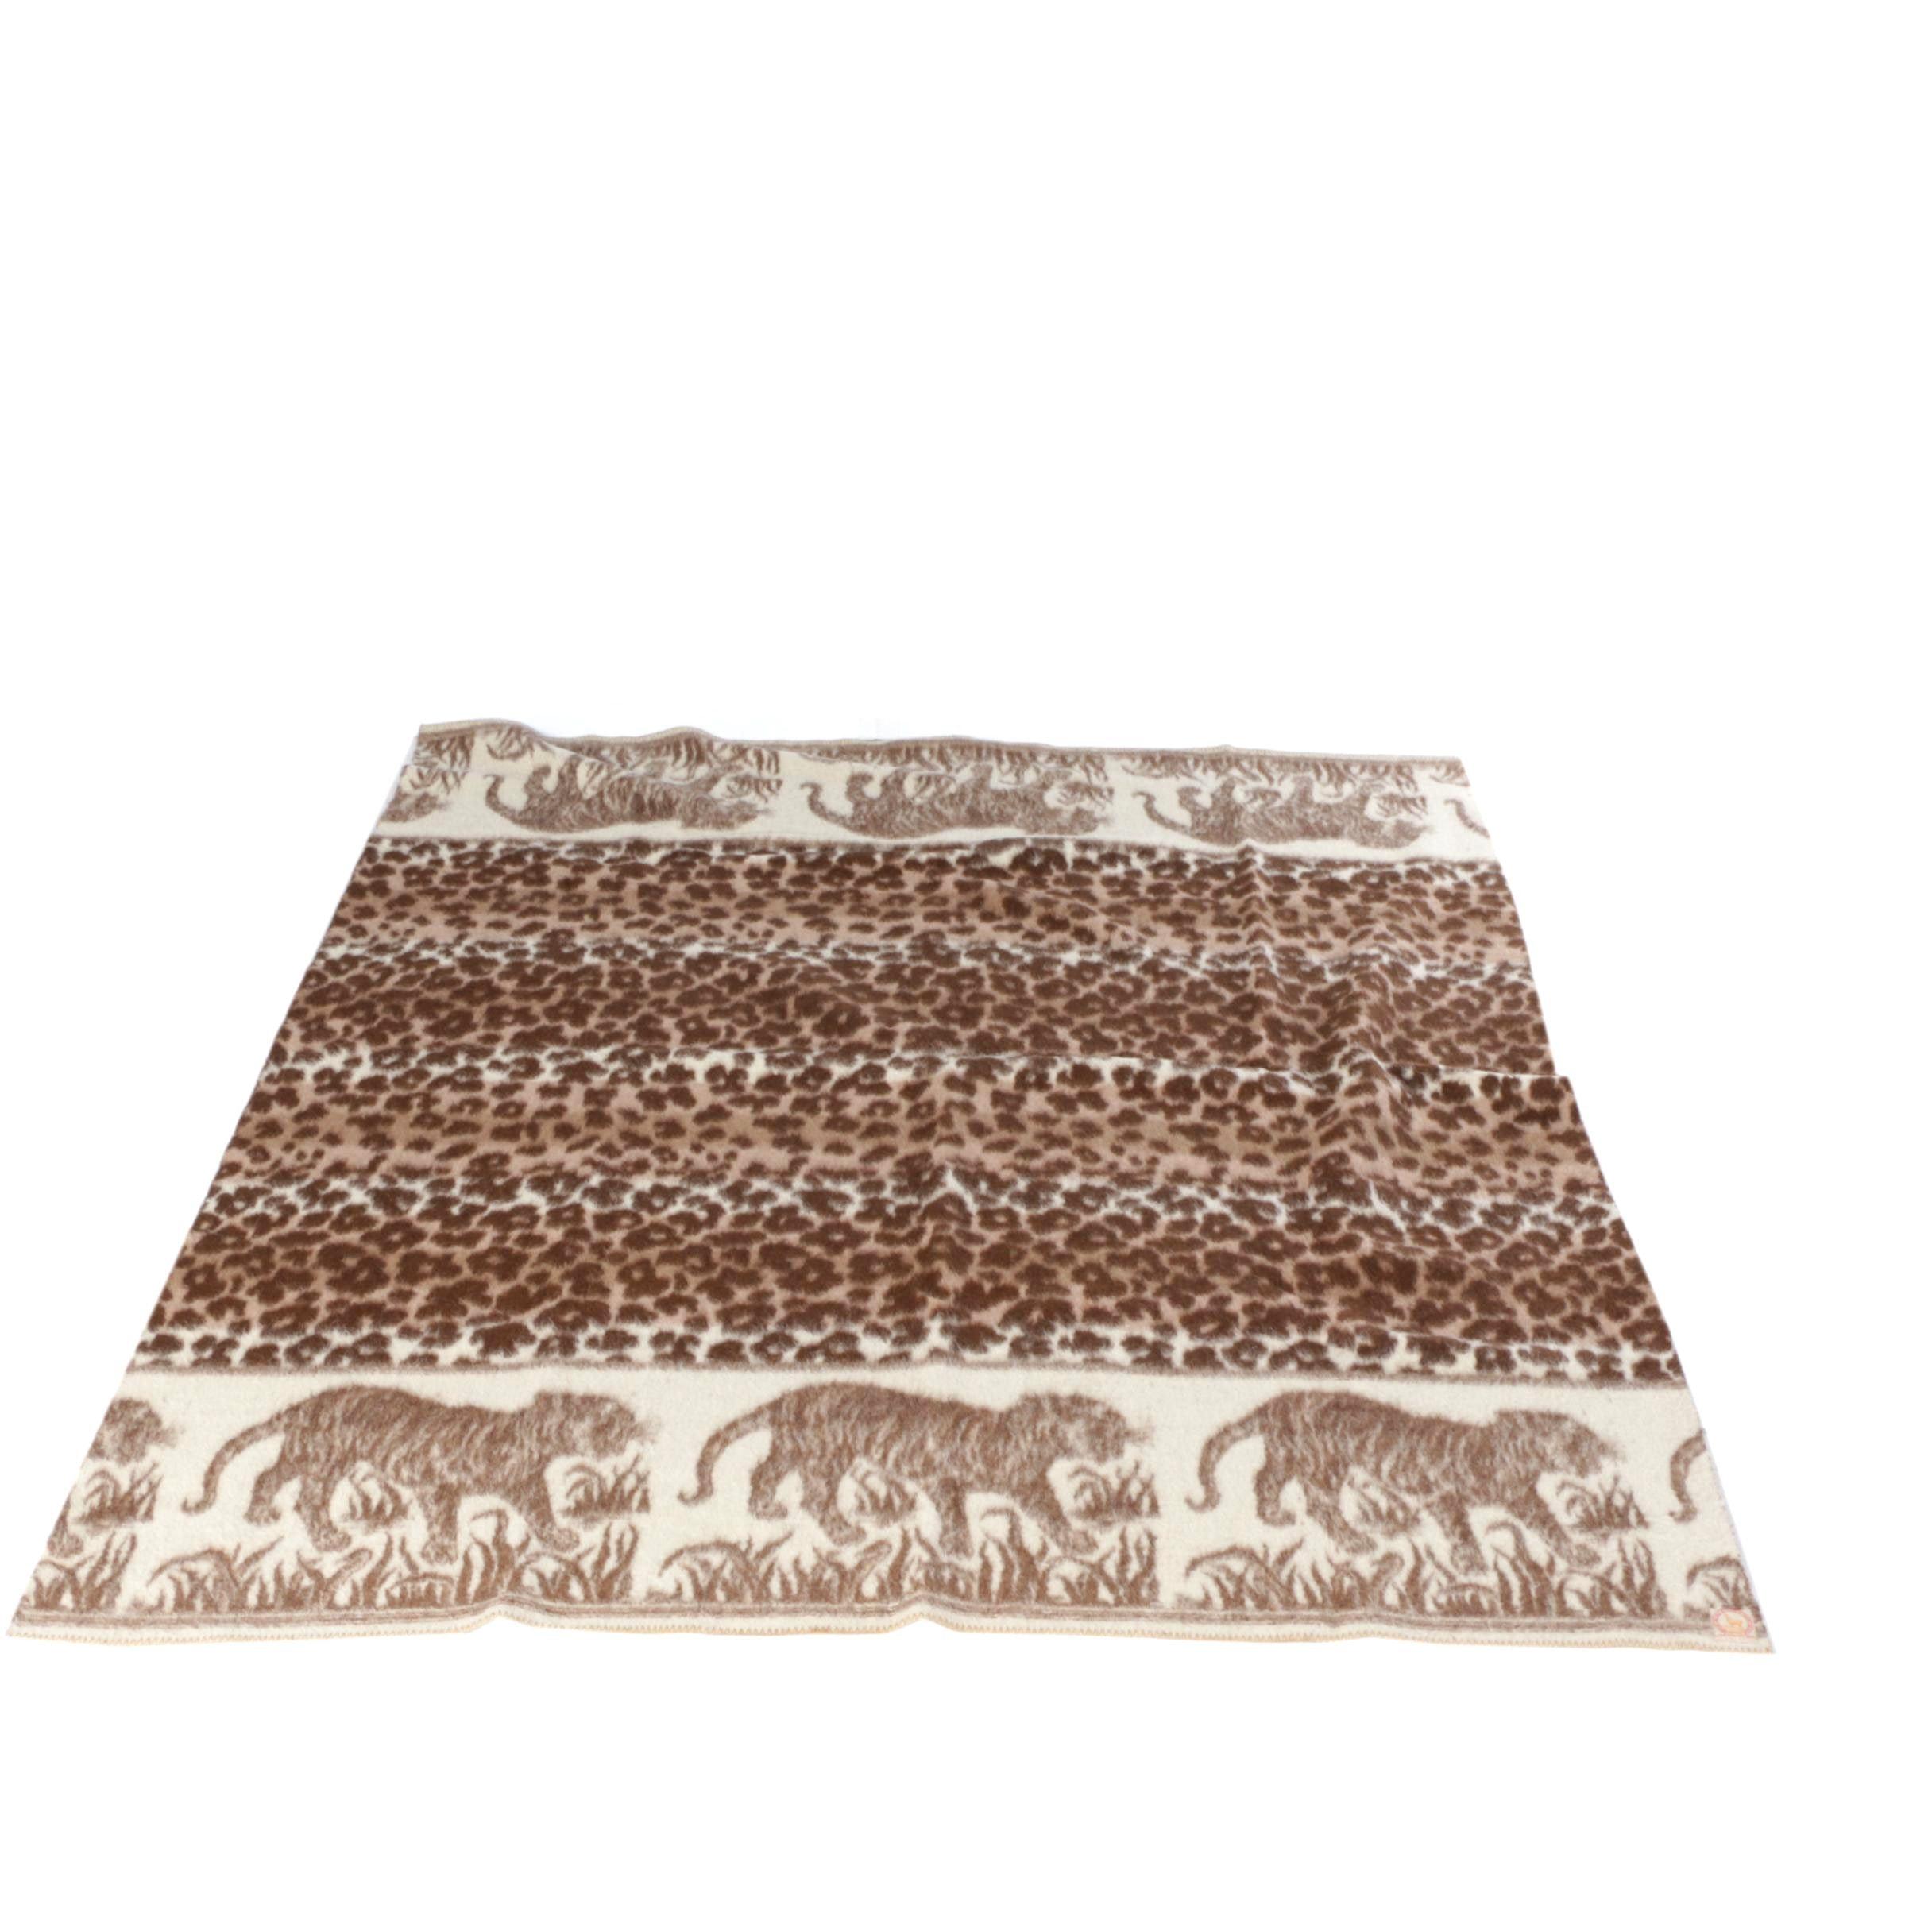 Peruvian Alpaca Wool Blanket